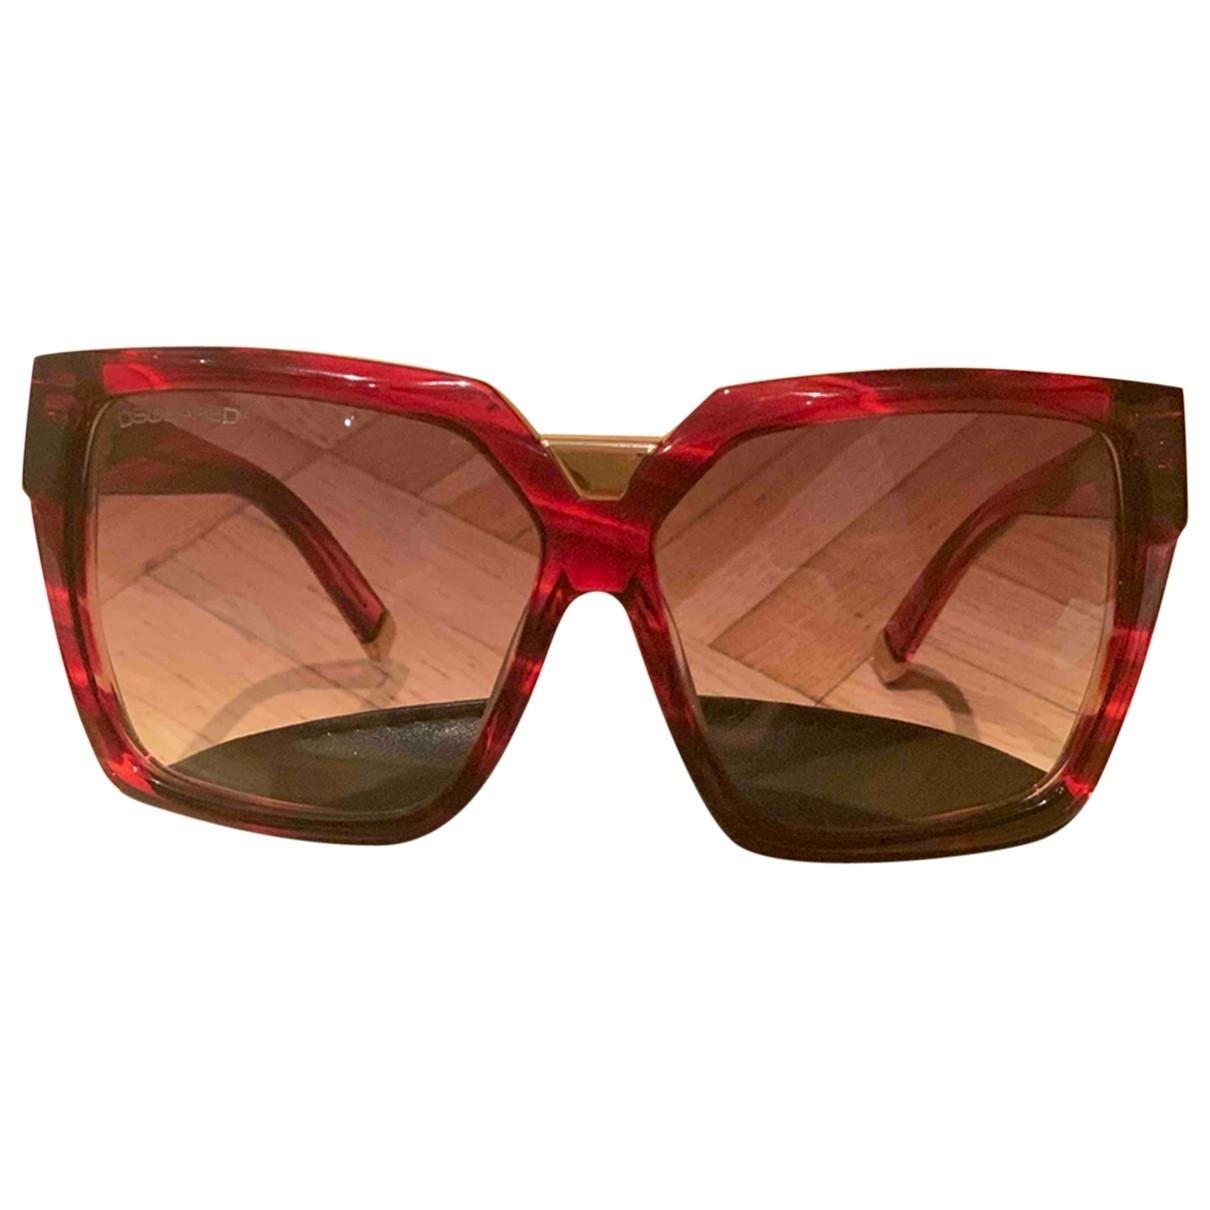 Dsquared2 \N Burgundy Sunglasses for Women \N